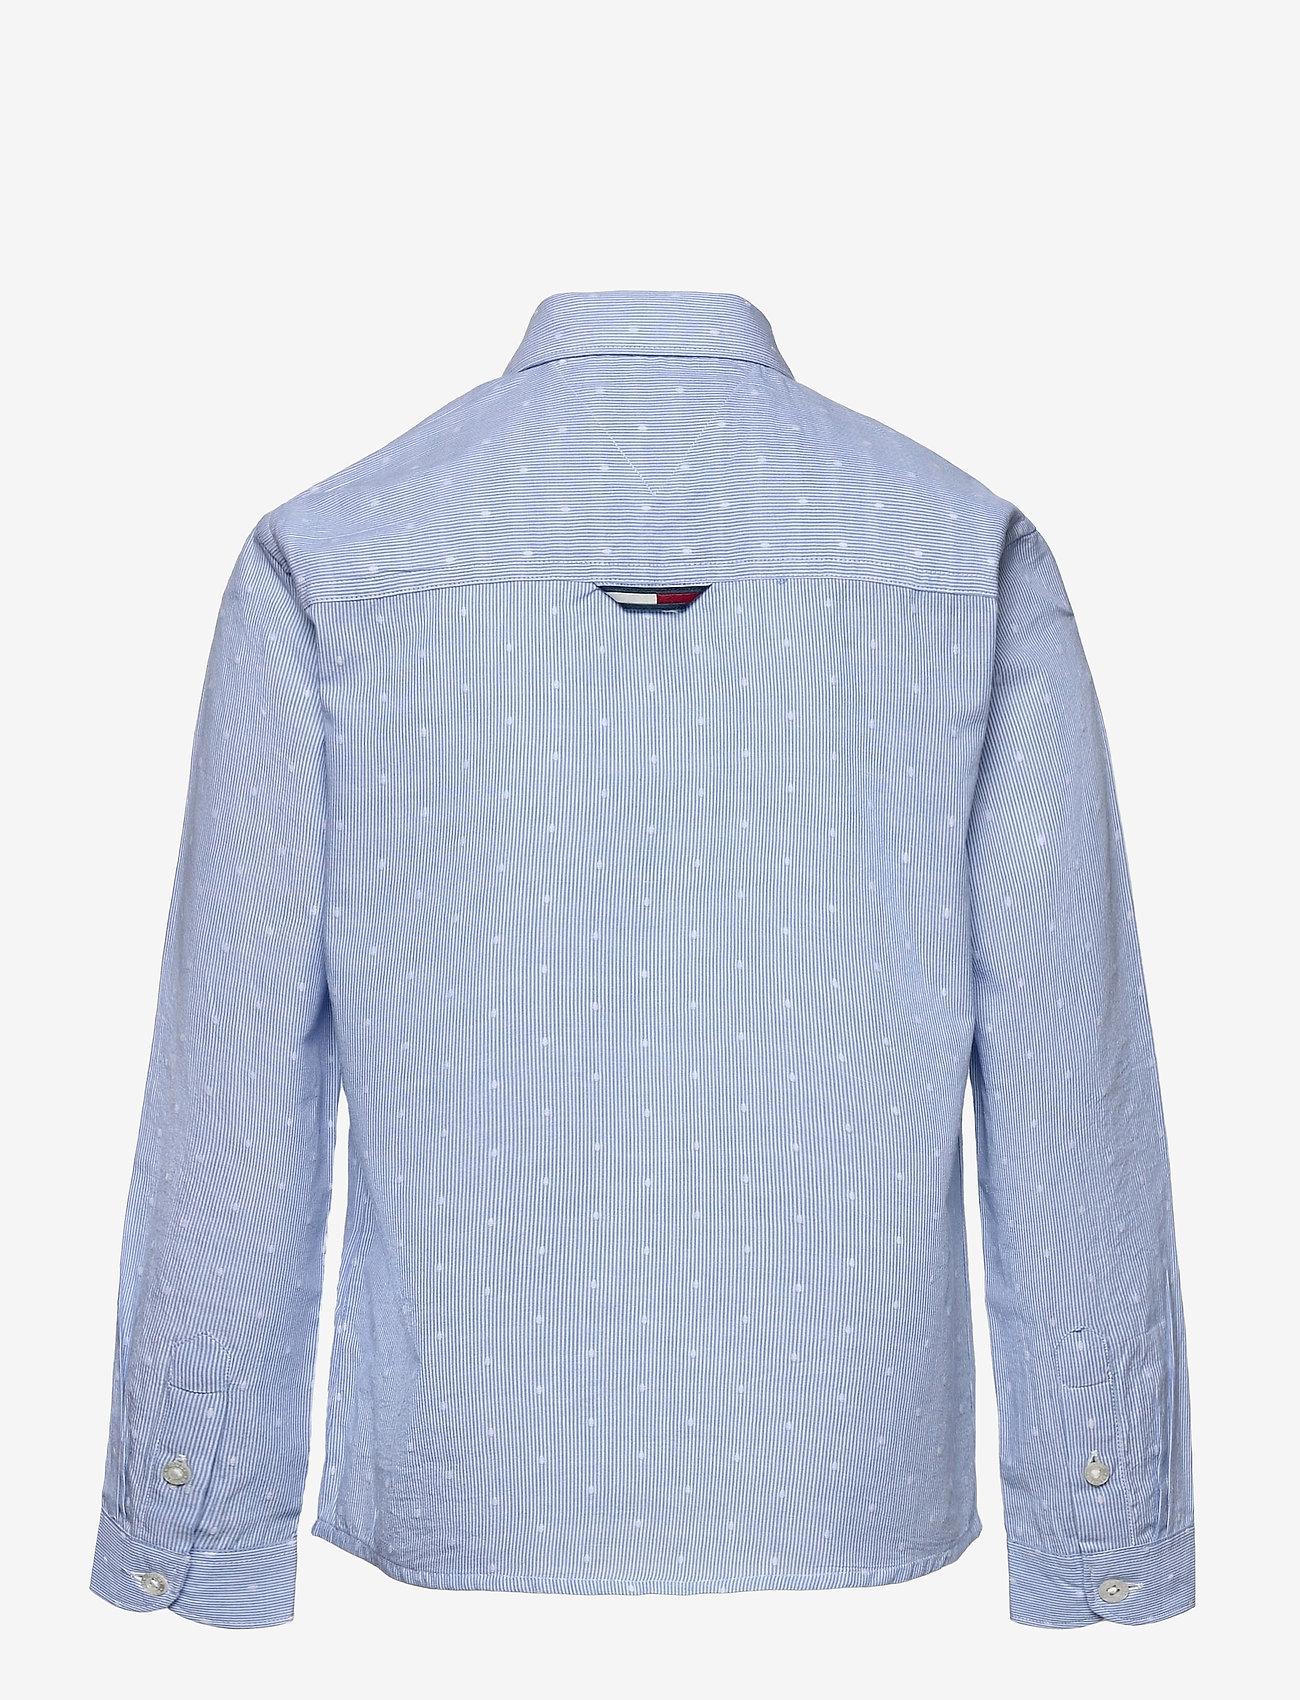 Tommy Hilfiger - DOTTED DOBBY SHIRT L/S - shirts - blue stripe - 1